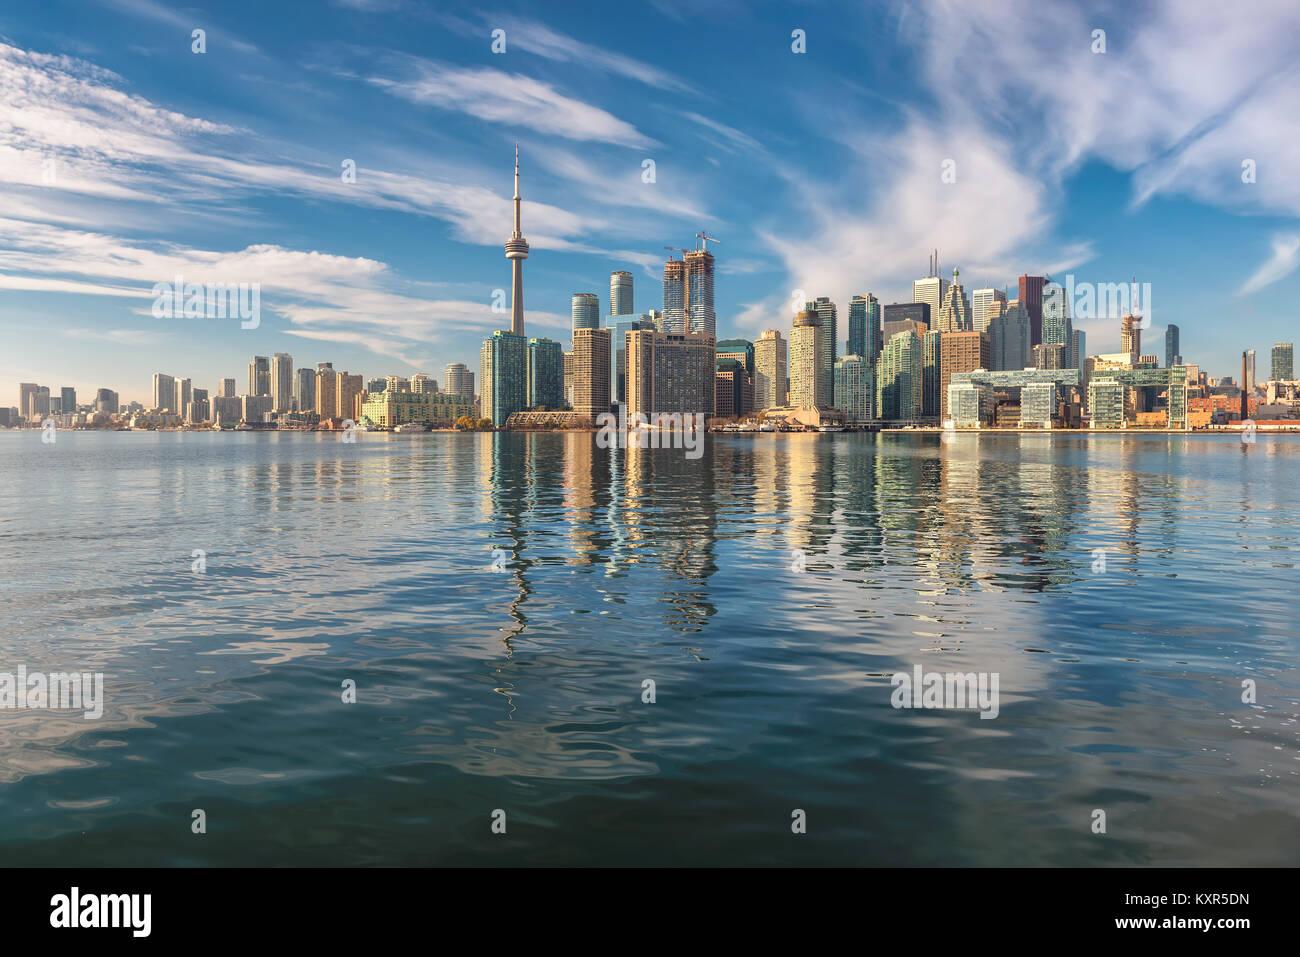 Toronto City skyline at sunset, Ontario, Canada. - Stock Image